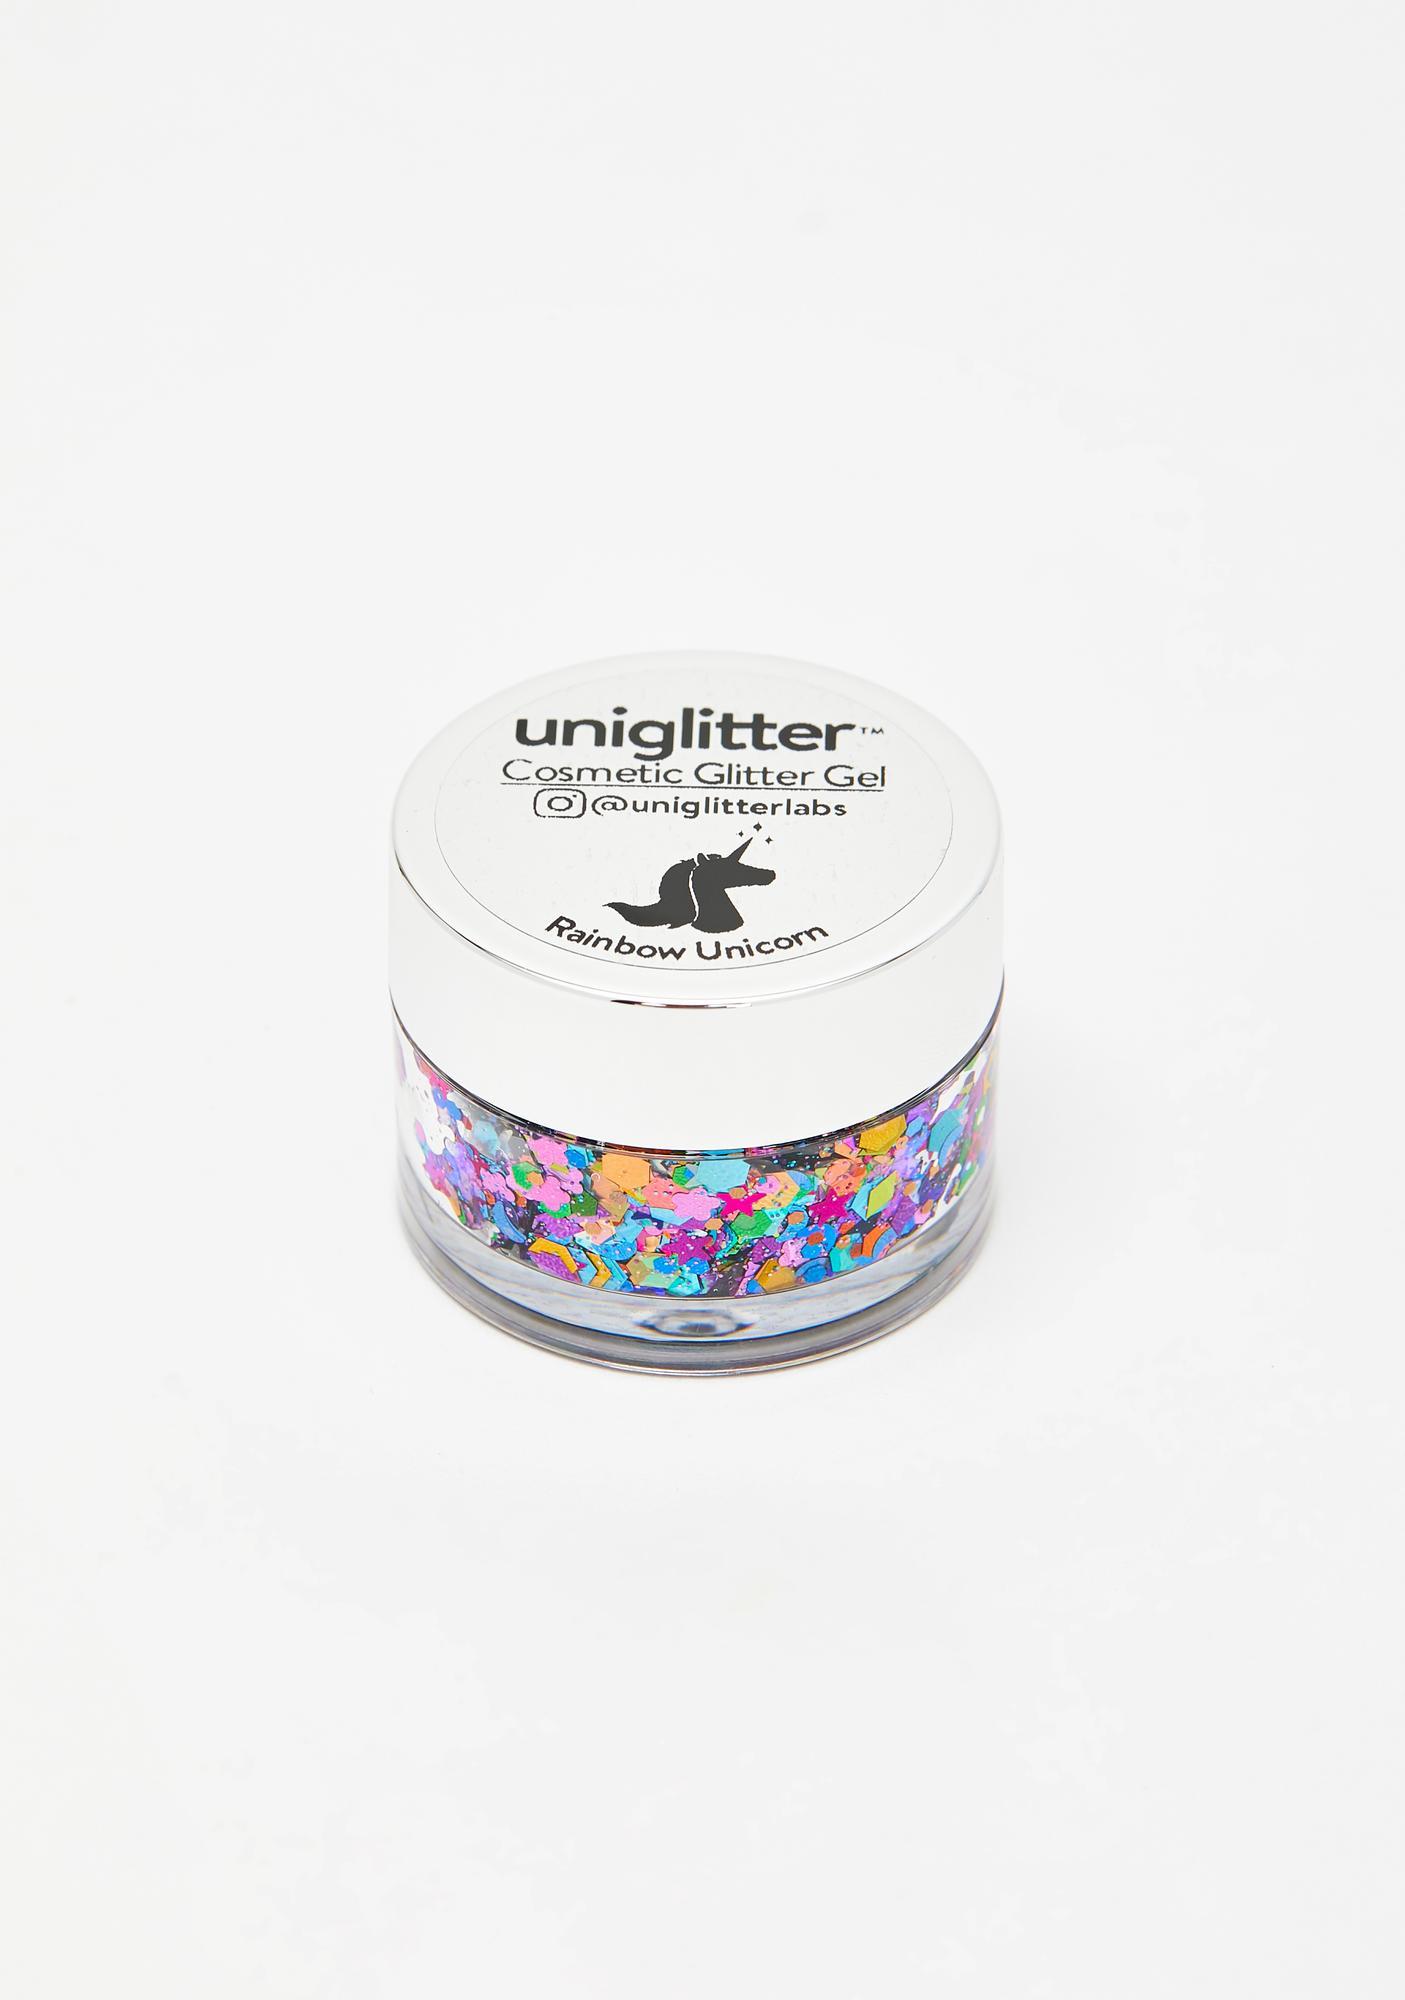 Uniglitter Rainbow Unicorn Glitter Gel